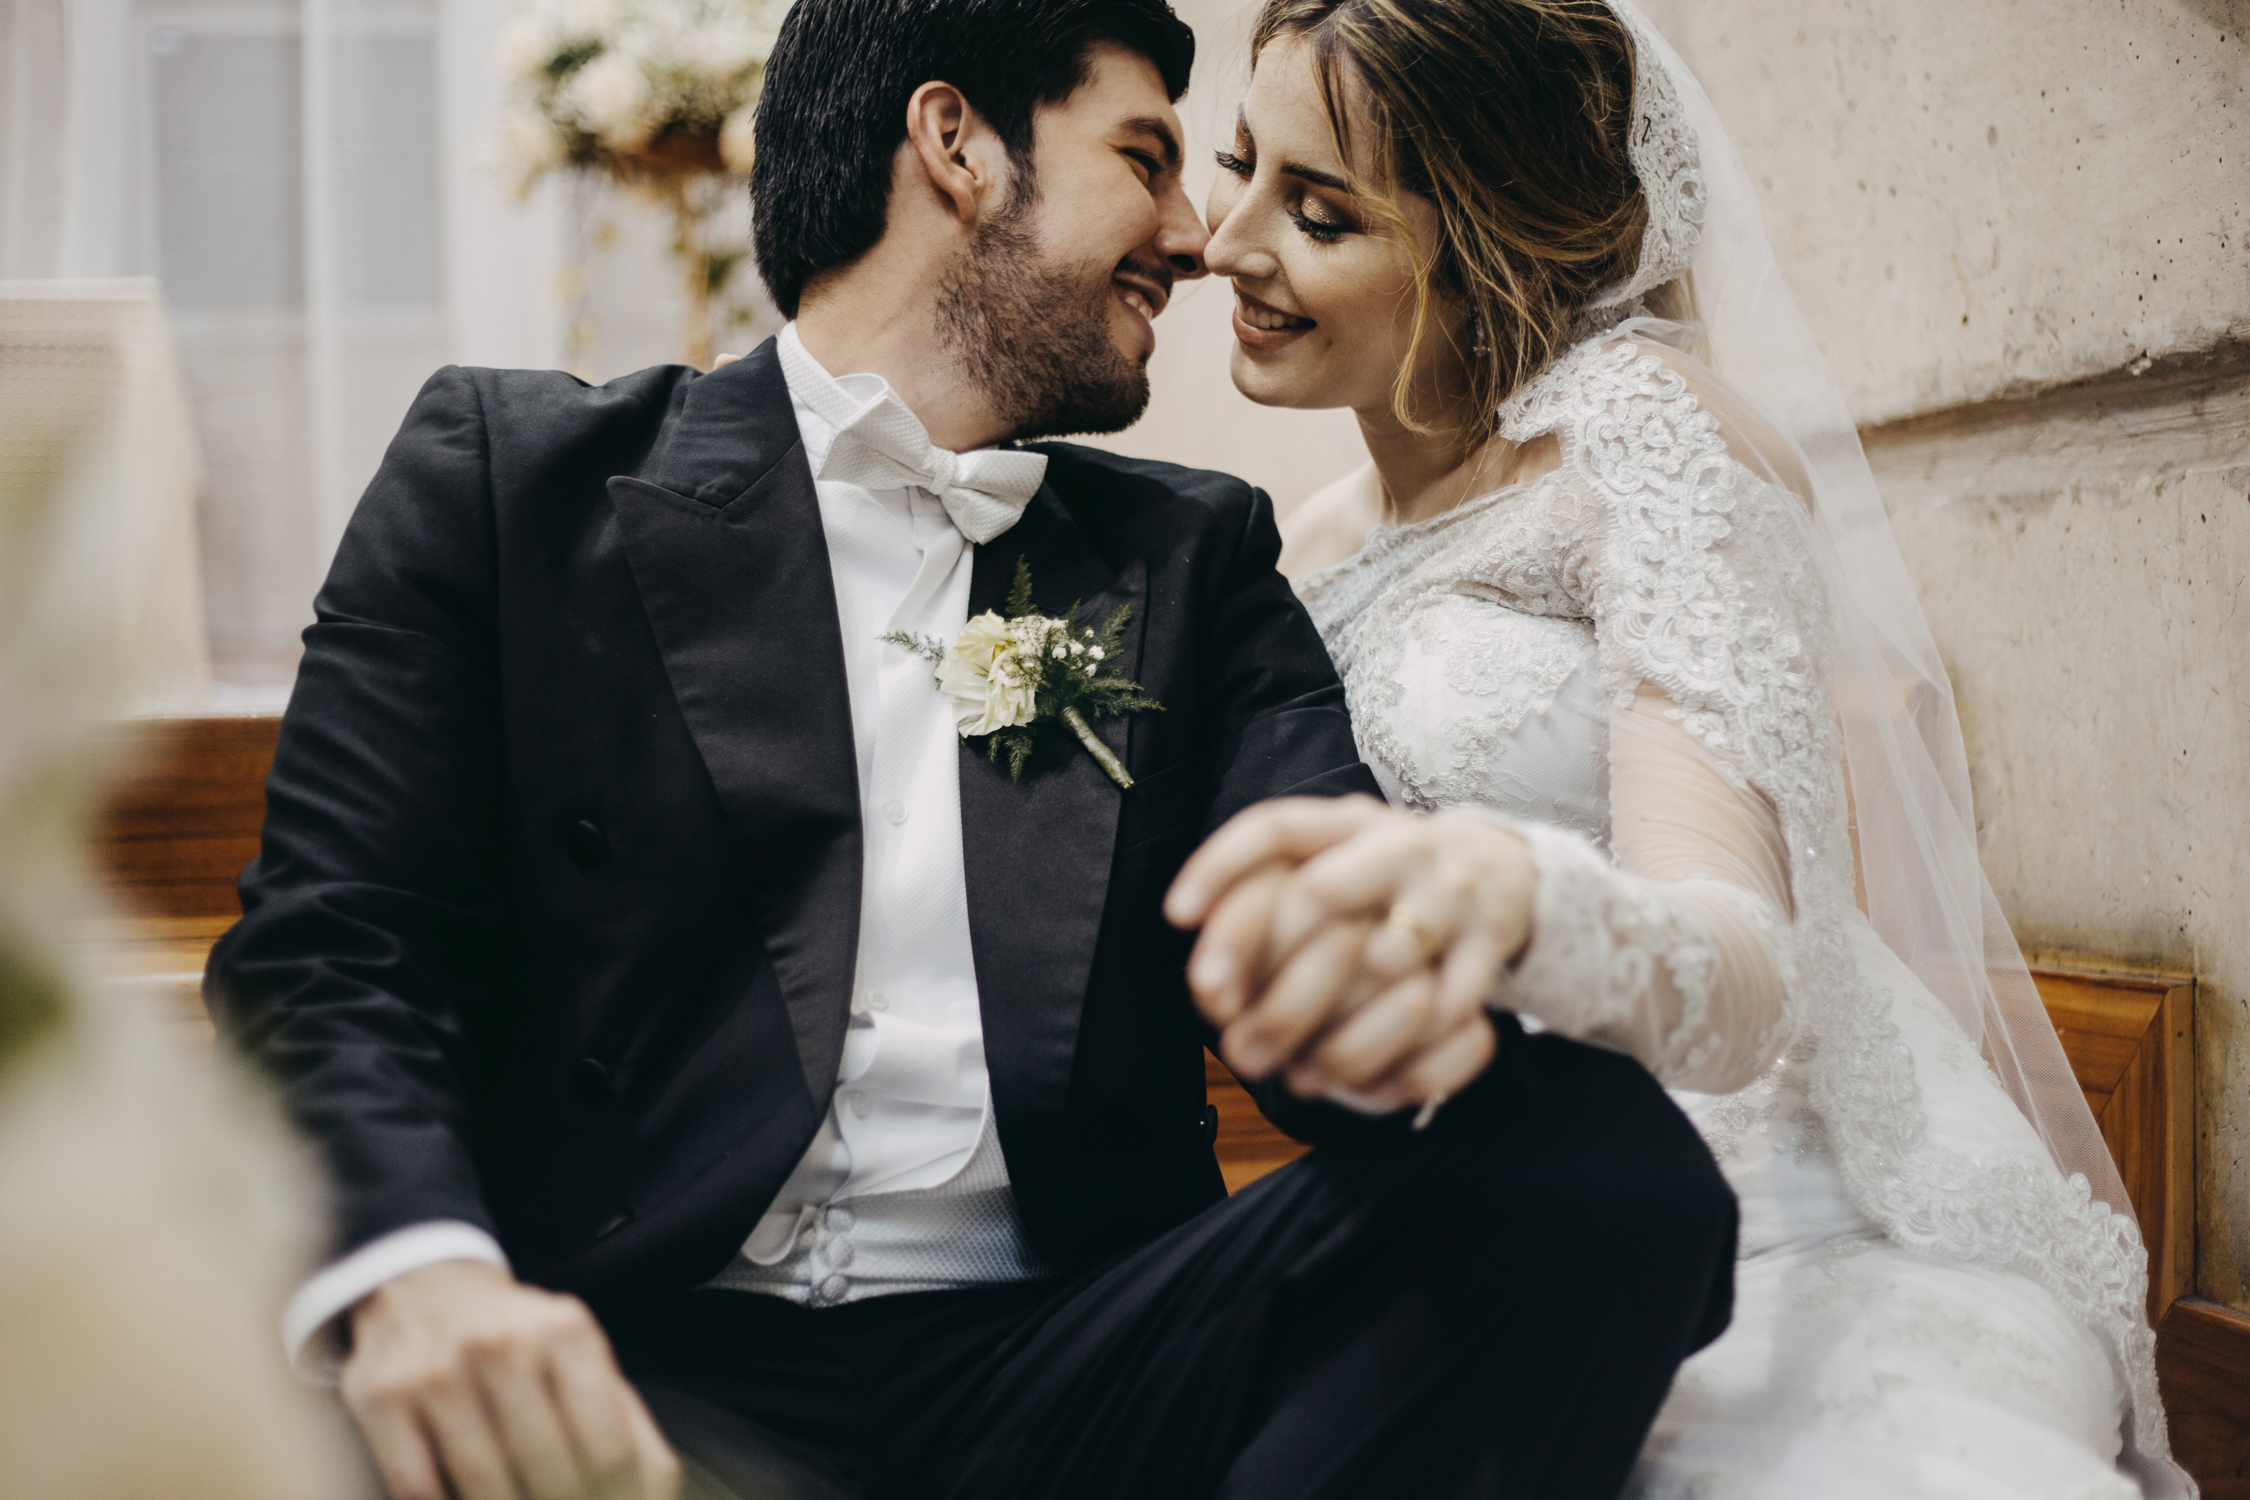 Michelle-Agurto-Fotografia-Bodas-Ecuador-Destination-Wedding-Photographer-Vicky-Javier-203.JPG